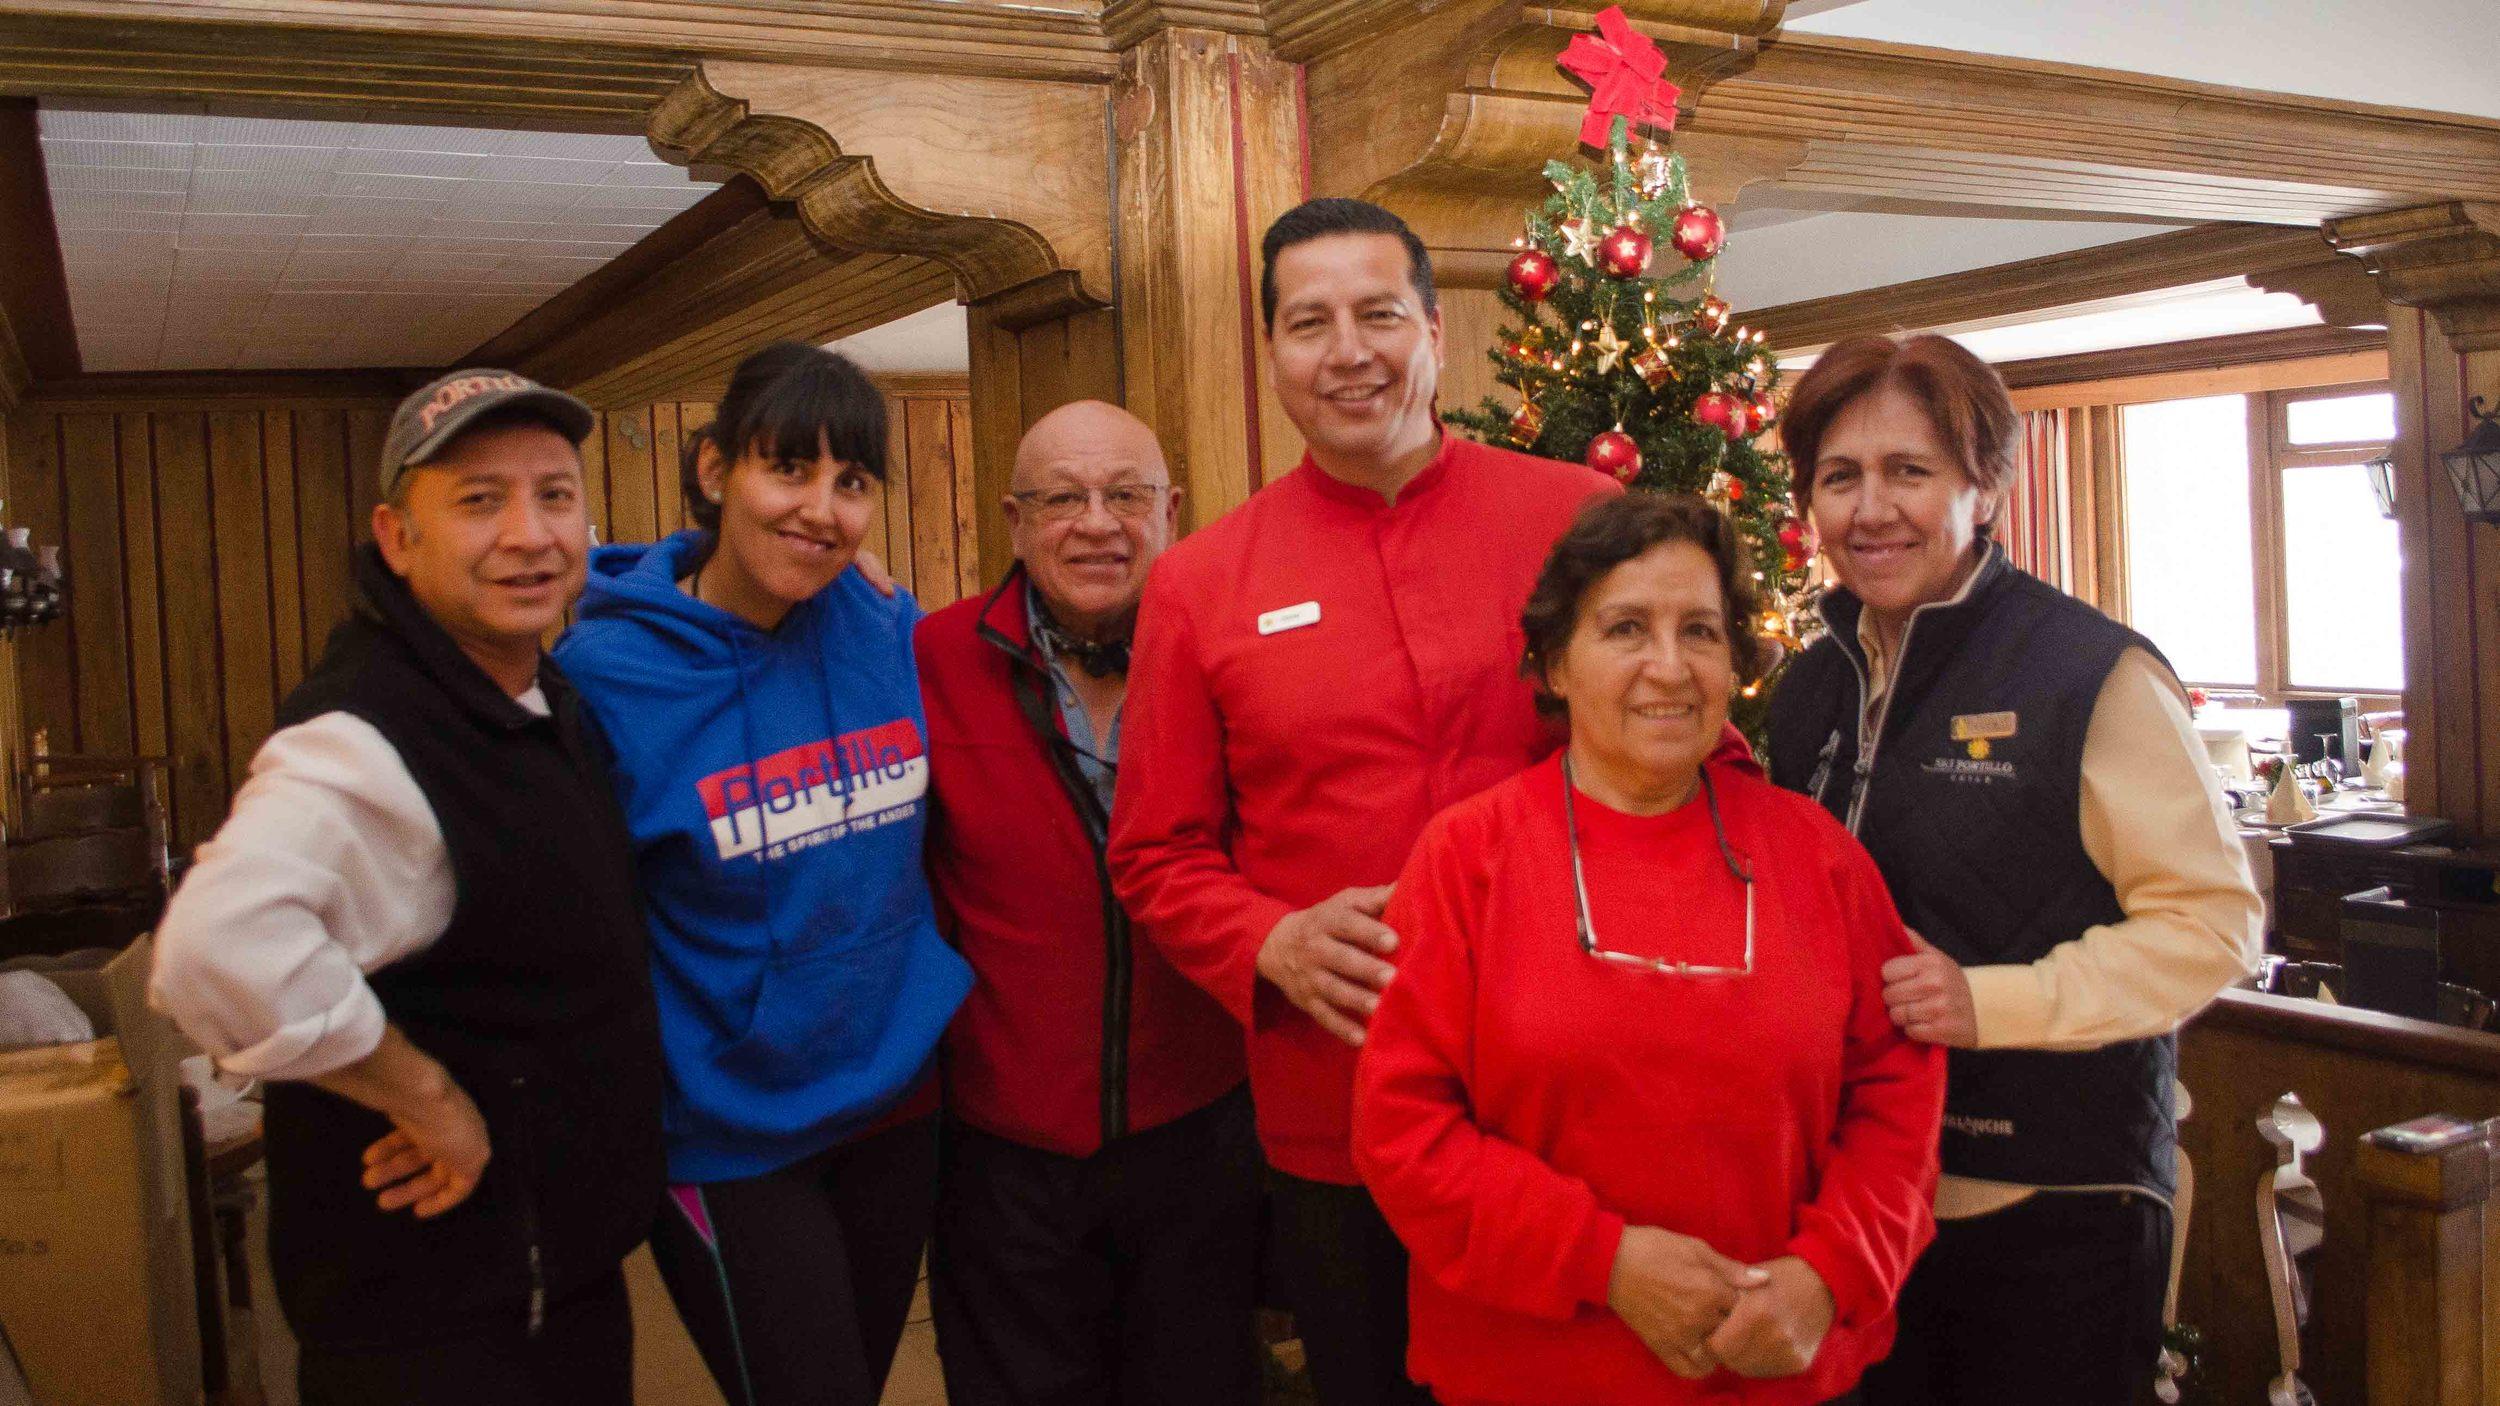 Good people at Ski Portillo // Buena gente en Ski Portillo